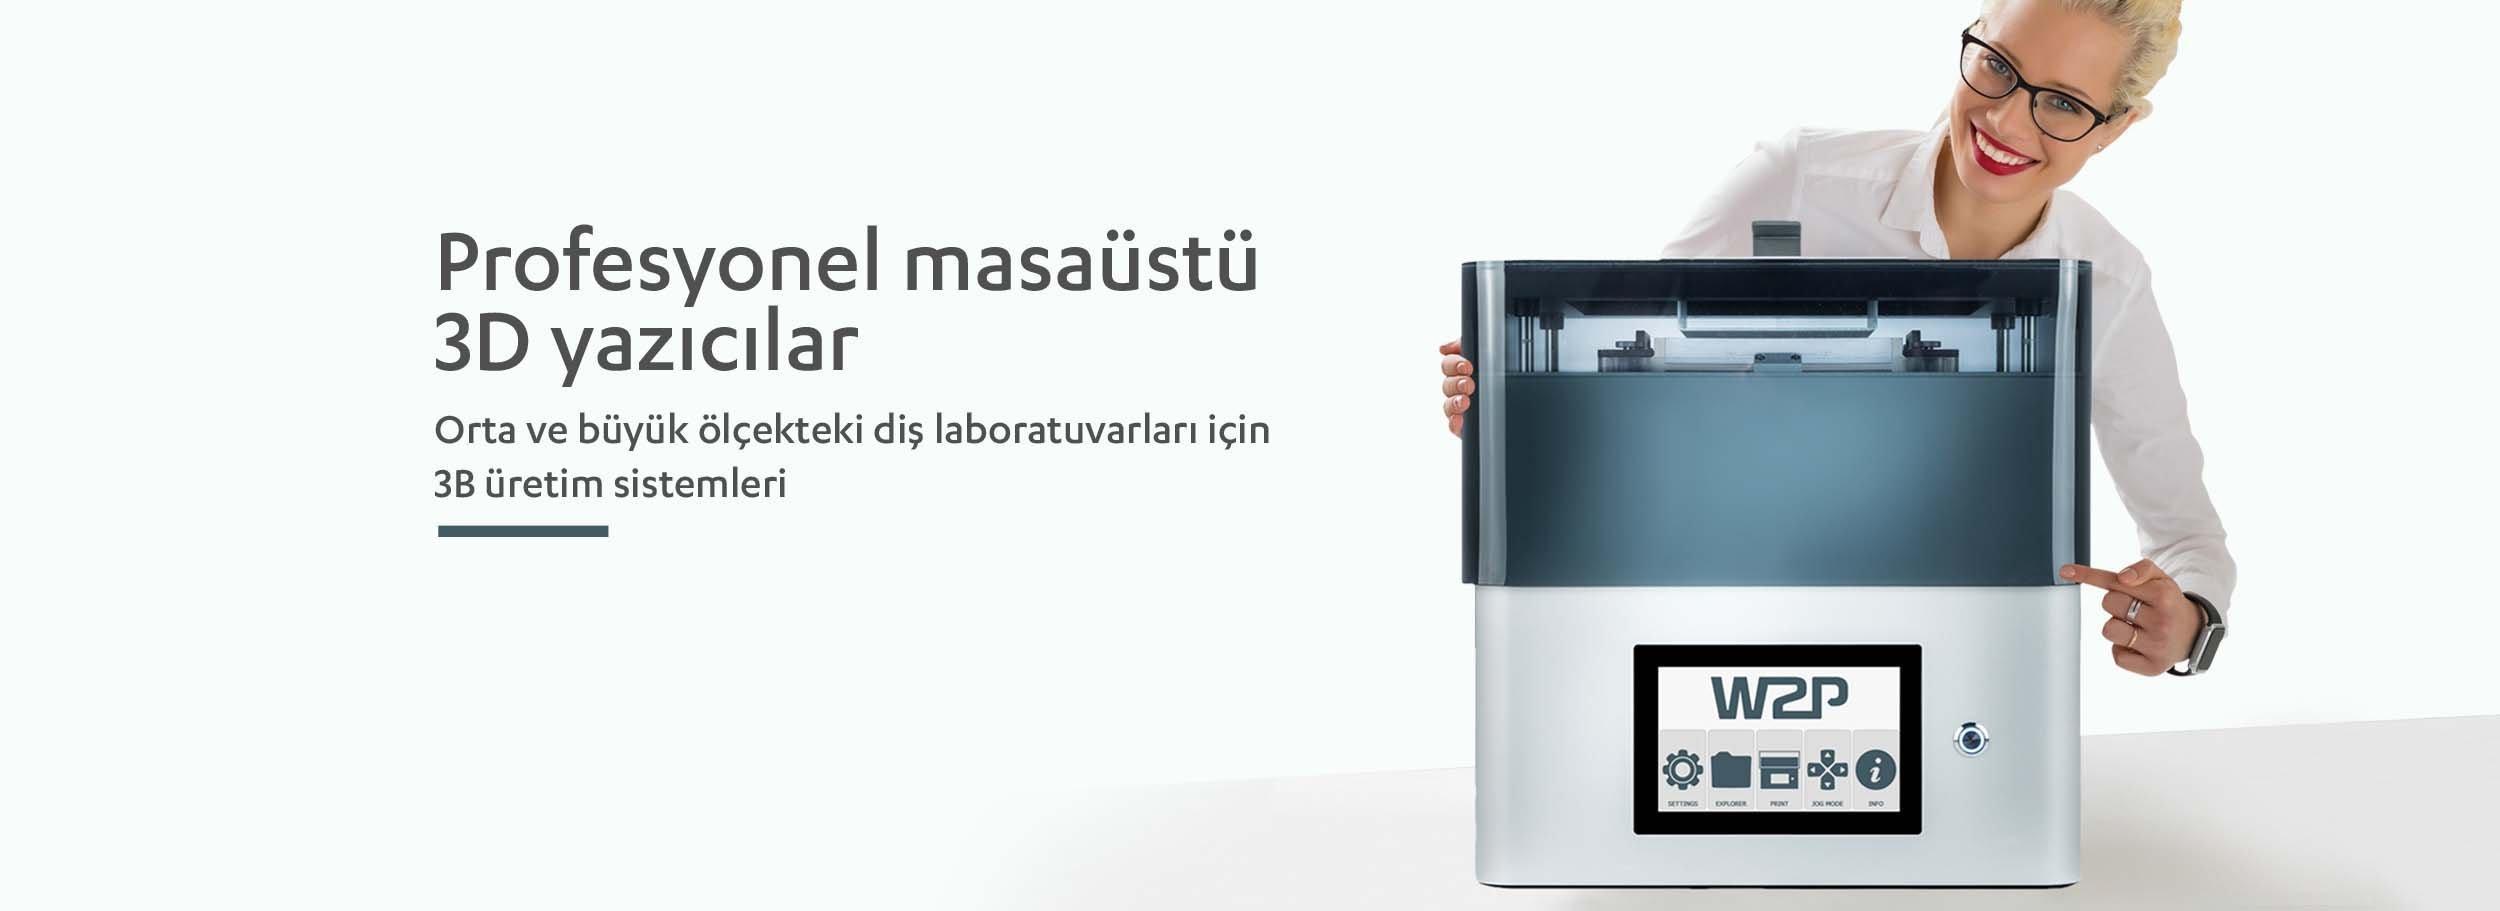 Labaratuvar Tipi 3D Printer